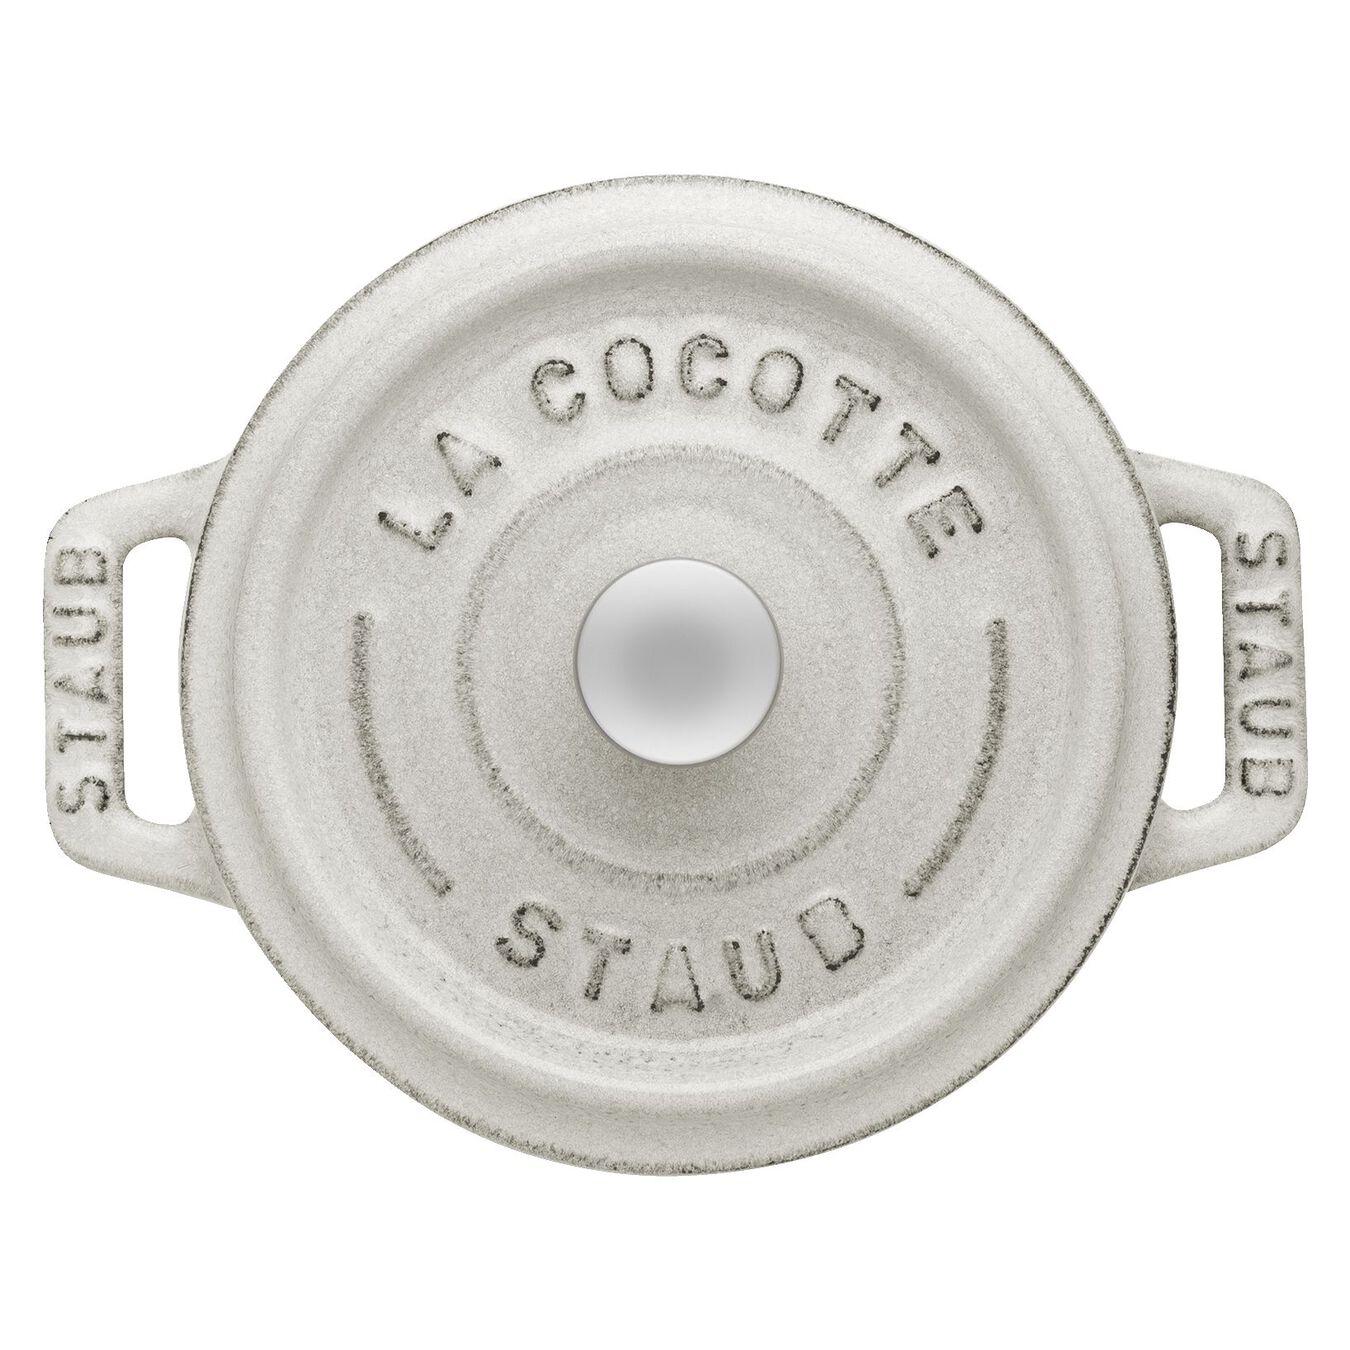 .25-qt Mini Round Cocotte - White Truffle,,large 3